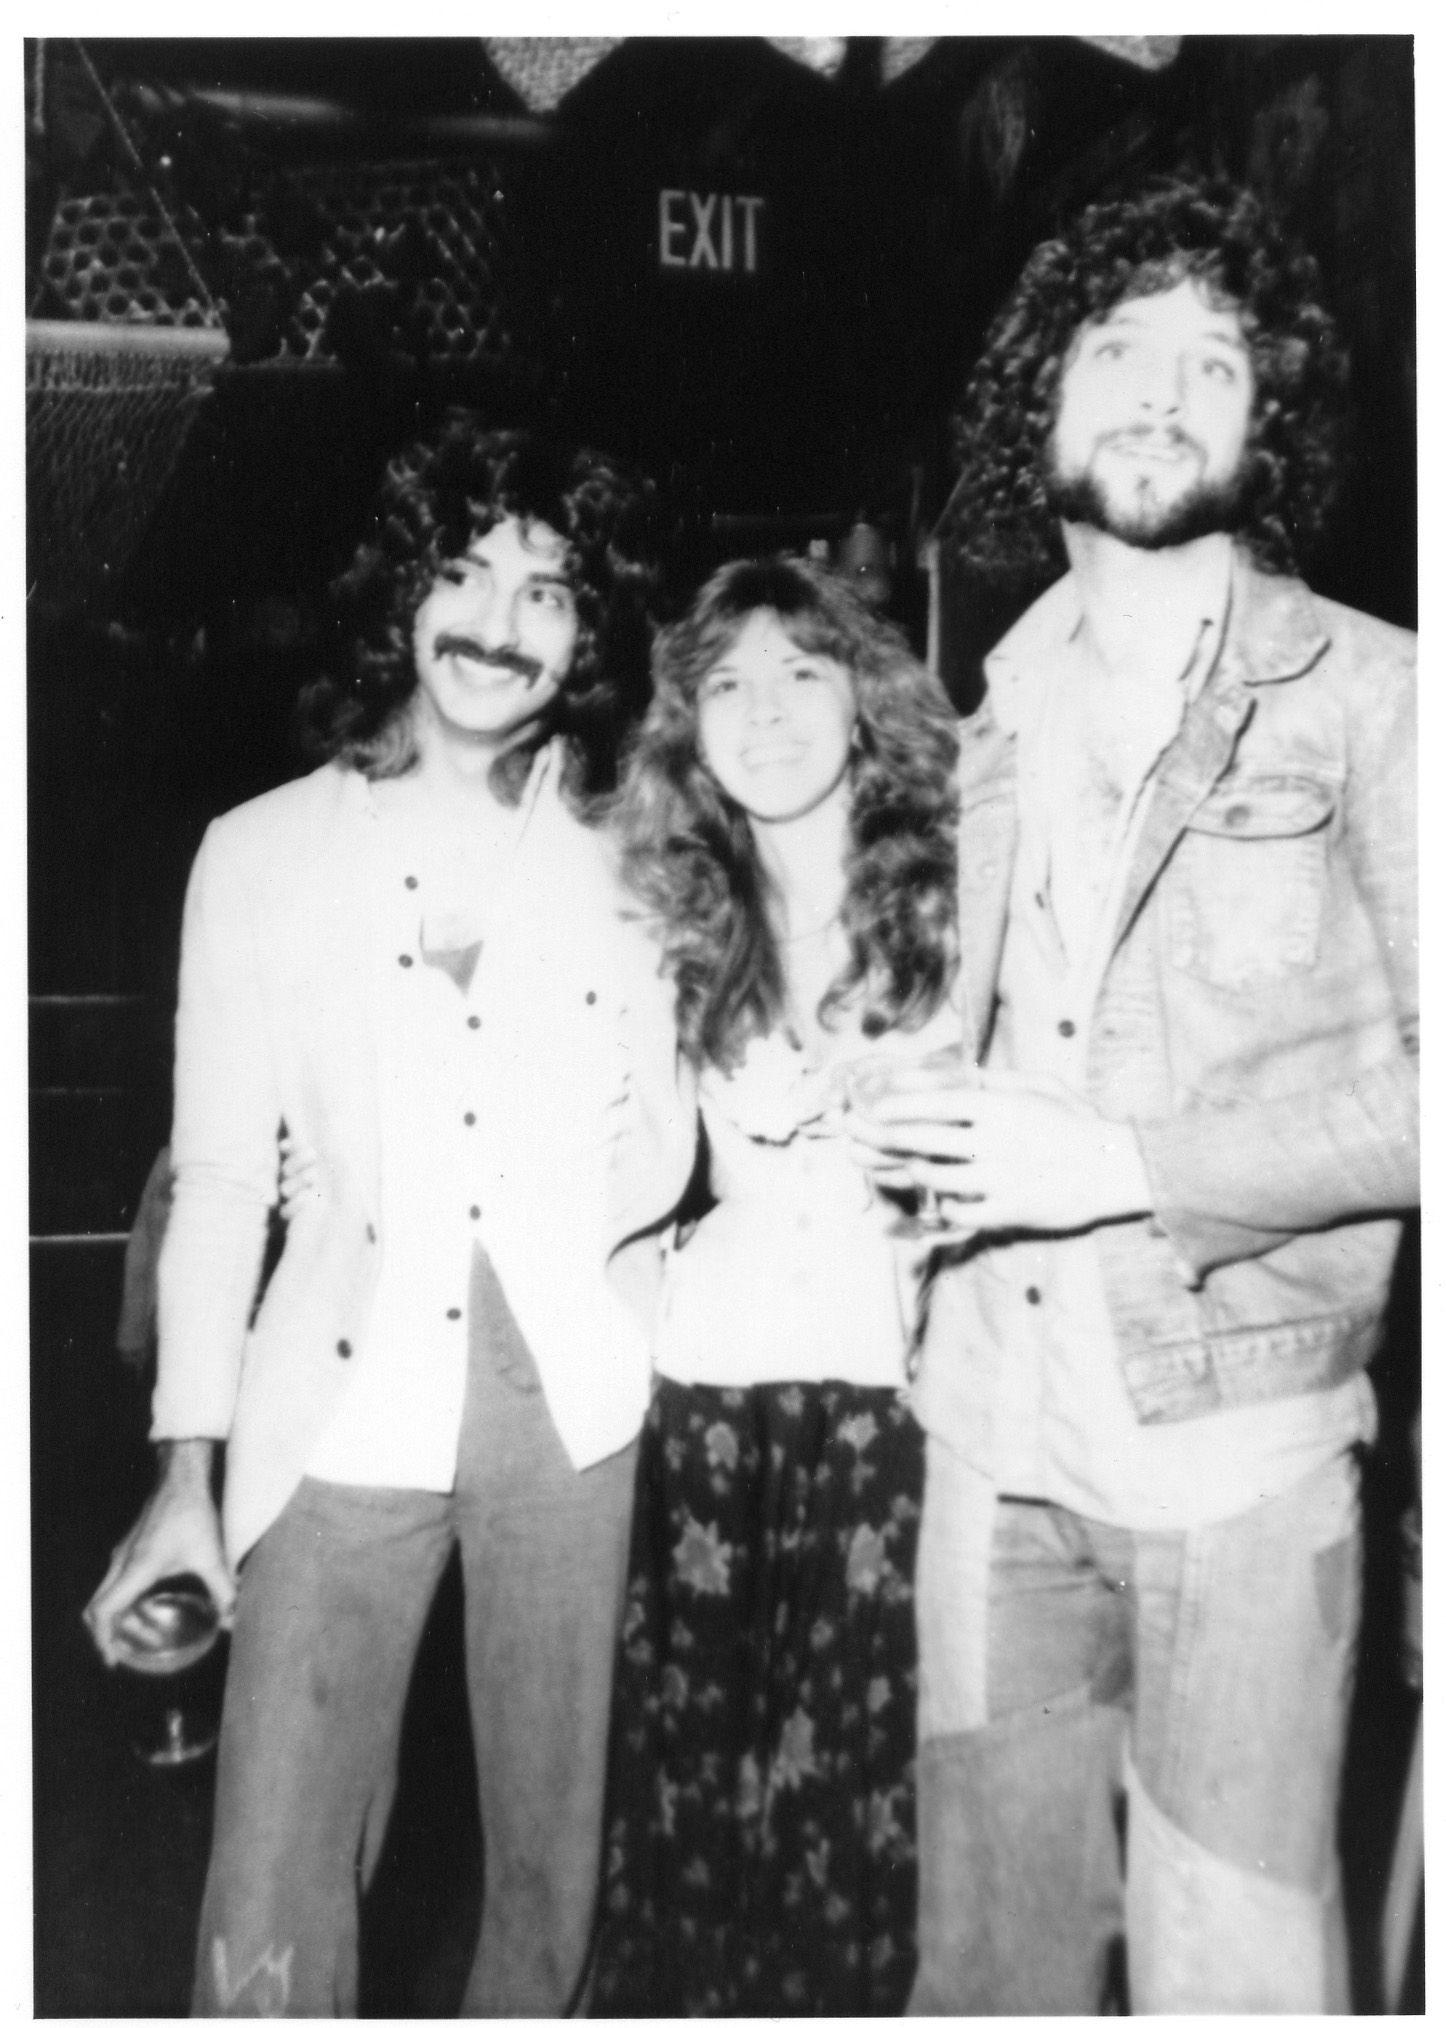 Bob Aguirre, Stevie Nicks, Lindsey Buckingham | Stevie Nicks